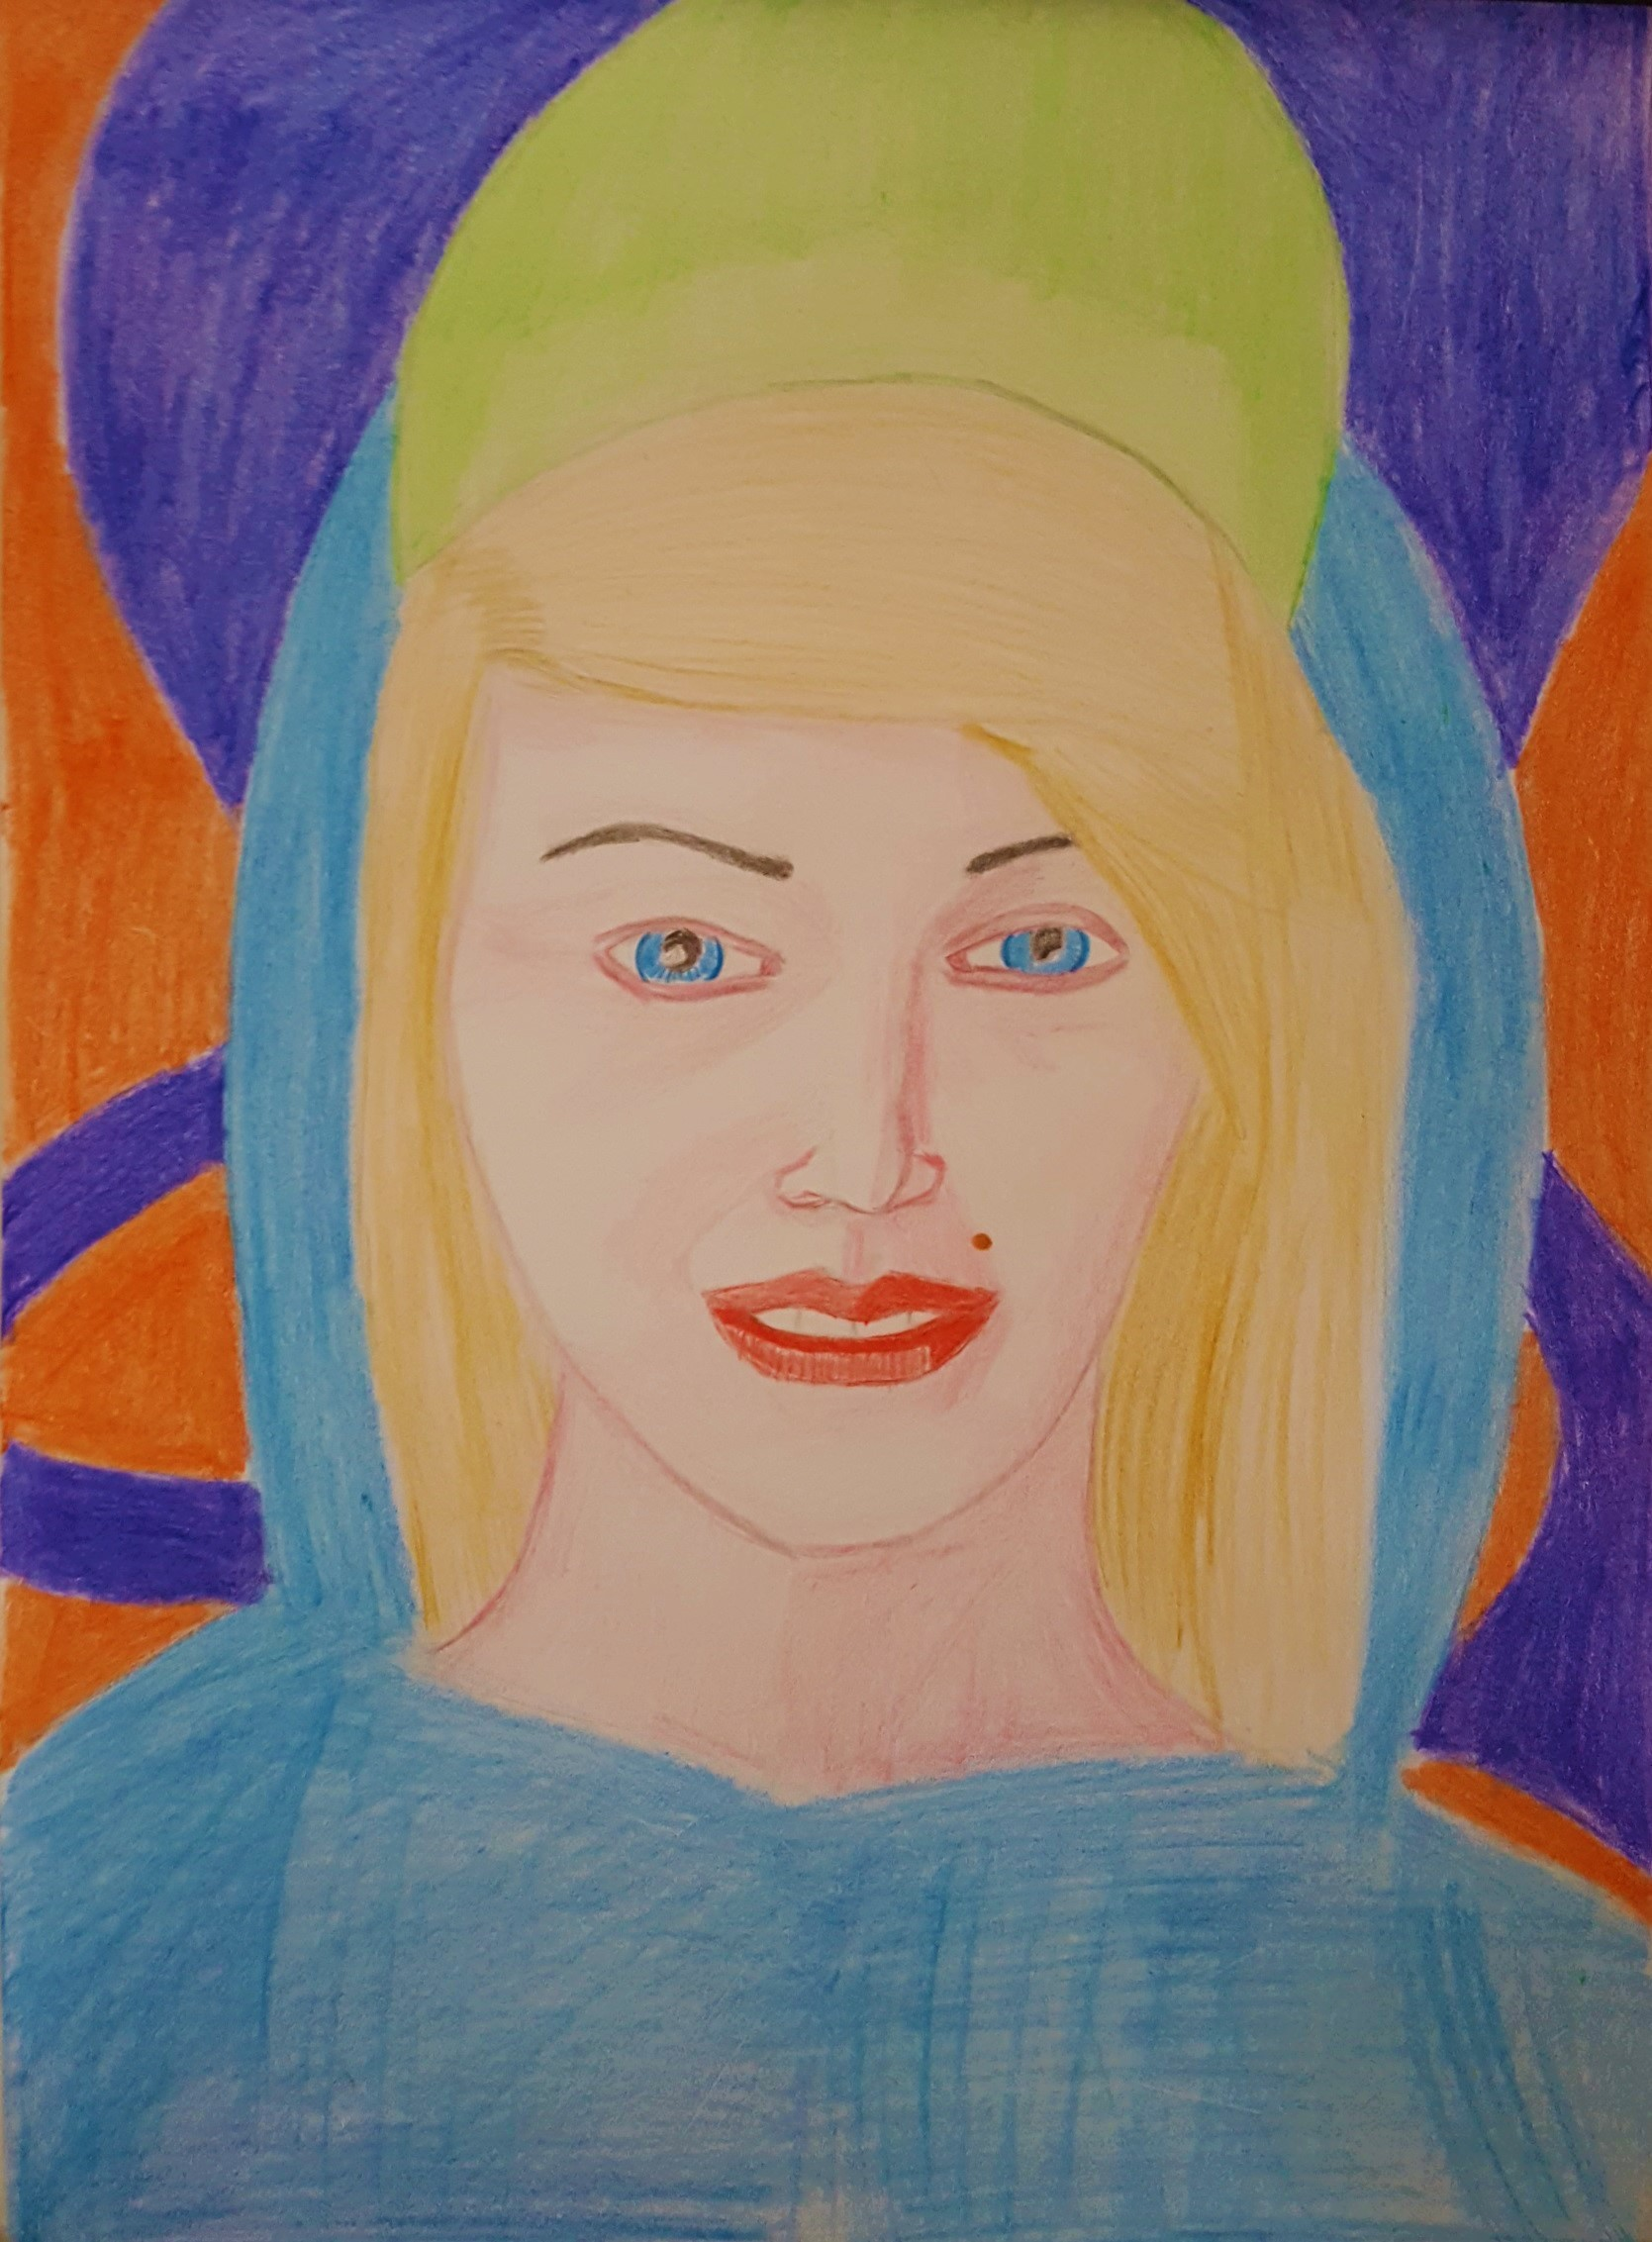 Girl in art museum by kestovaari